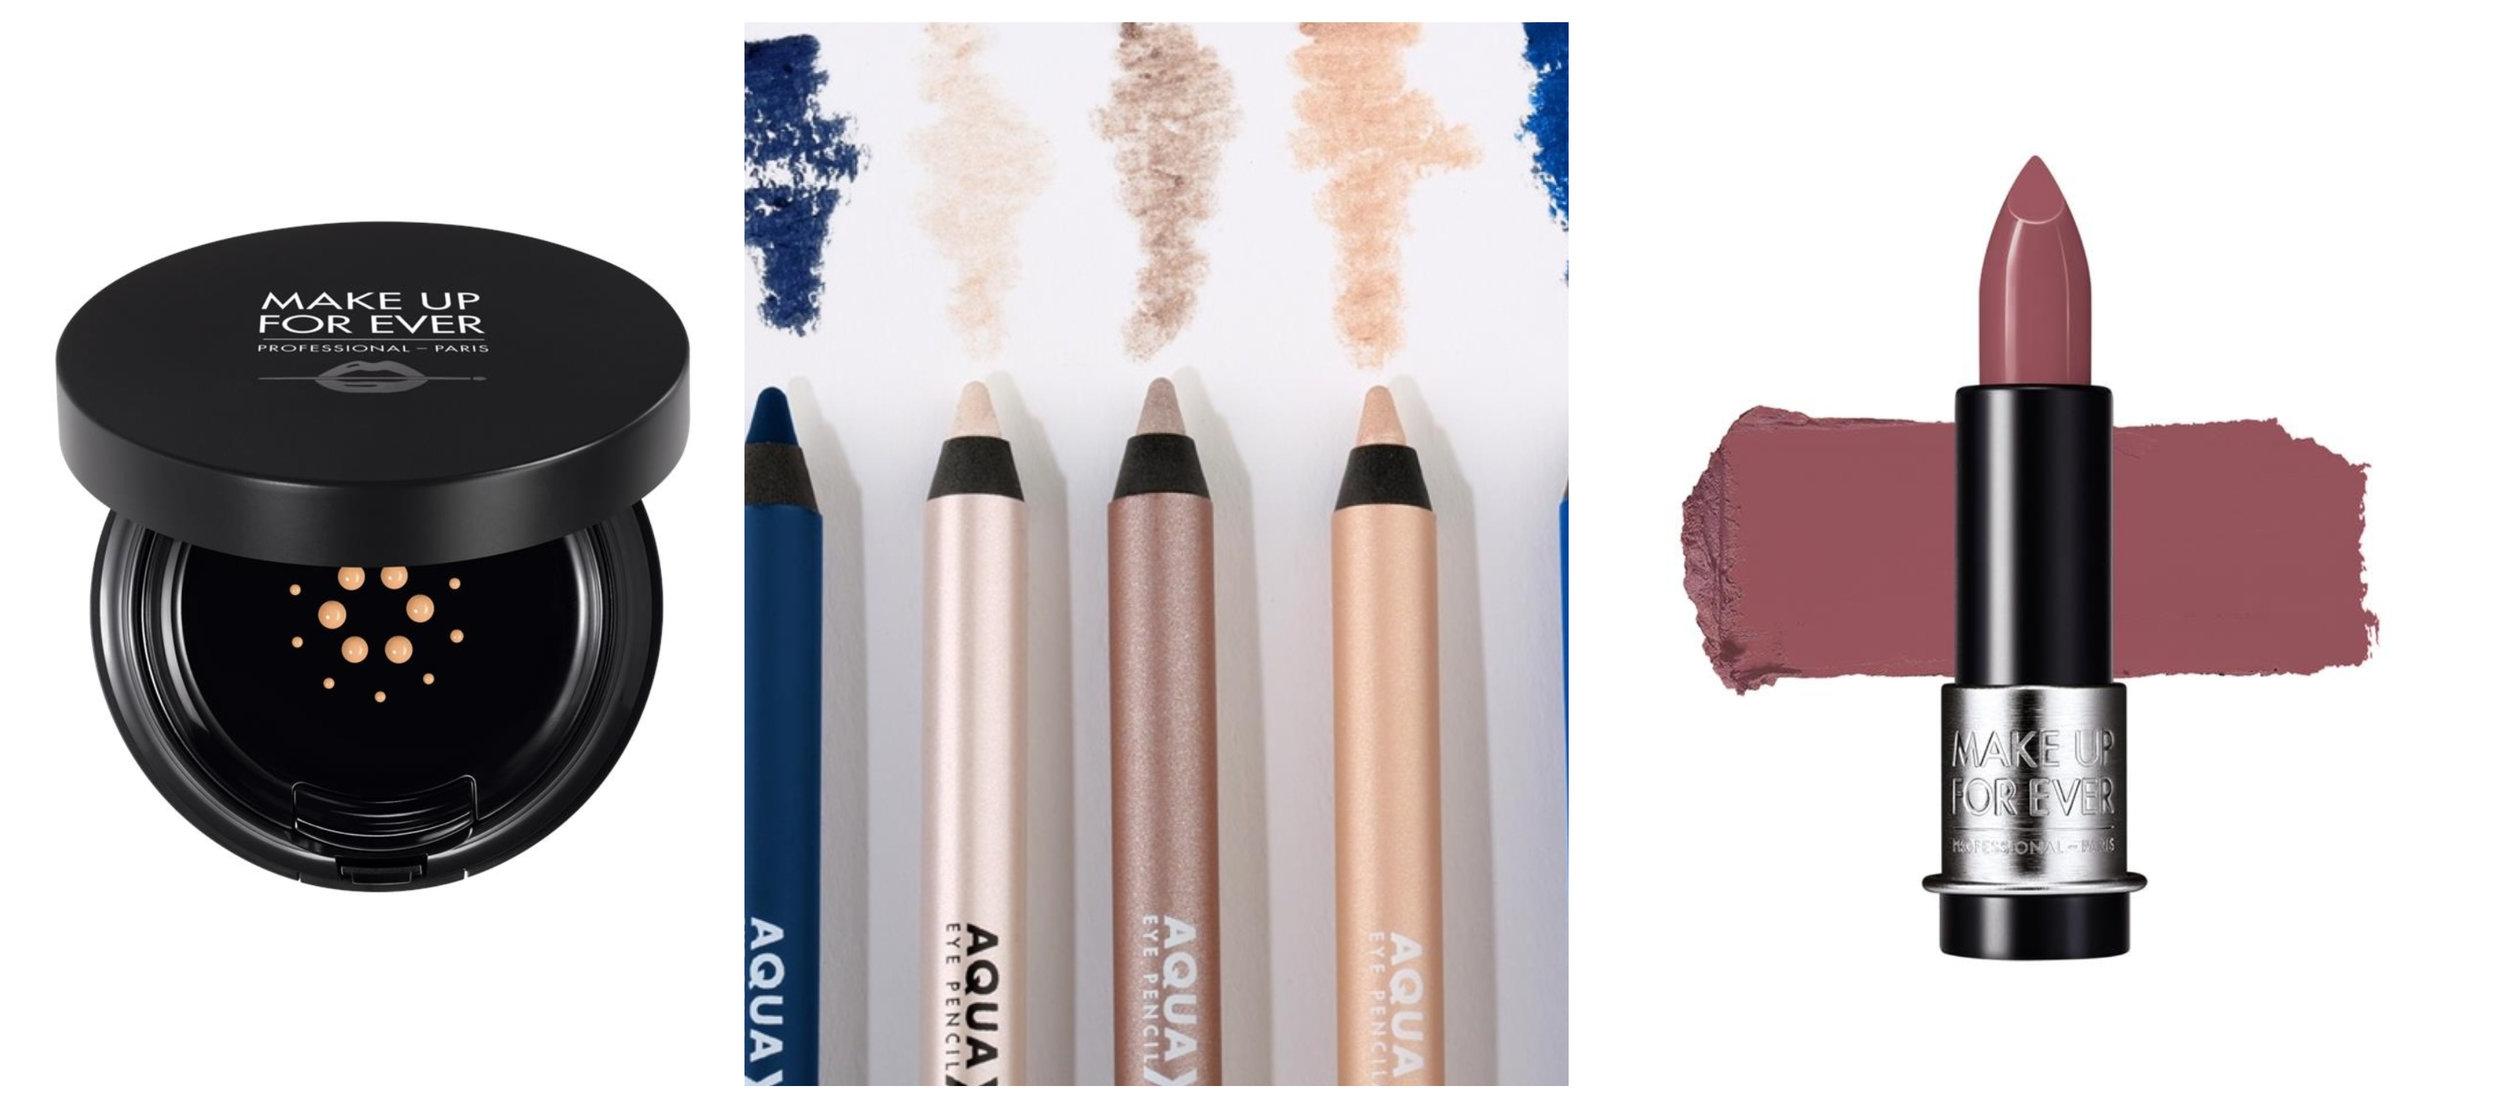 Make Up For Ever CUSHION LIGHT VELVET SPF50 - Y245 ,  Make Up For Ever AQUA XL EYE PENCIL - Waterproof Eyeliner - Waterproof Eyeliner 1,2G M-10 ,  Make Up For Ever LIPSTICK ARTIST ROUGE MAT - Matte High Pigmented Lipstick 3,5g M206